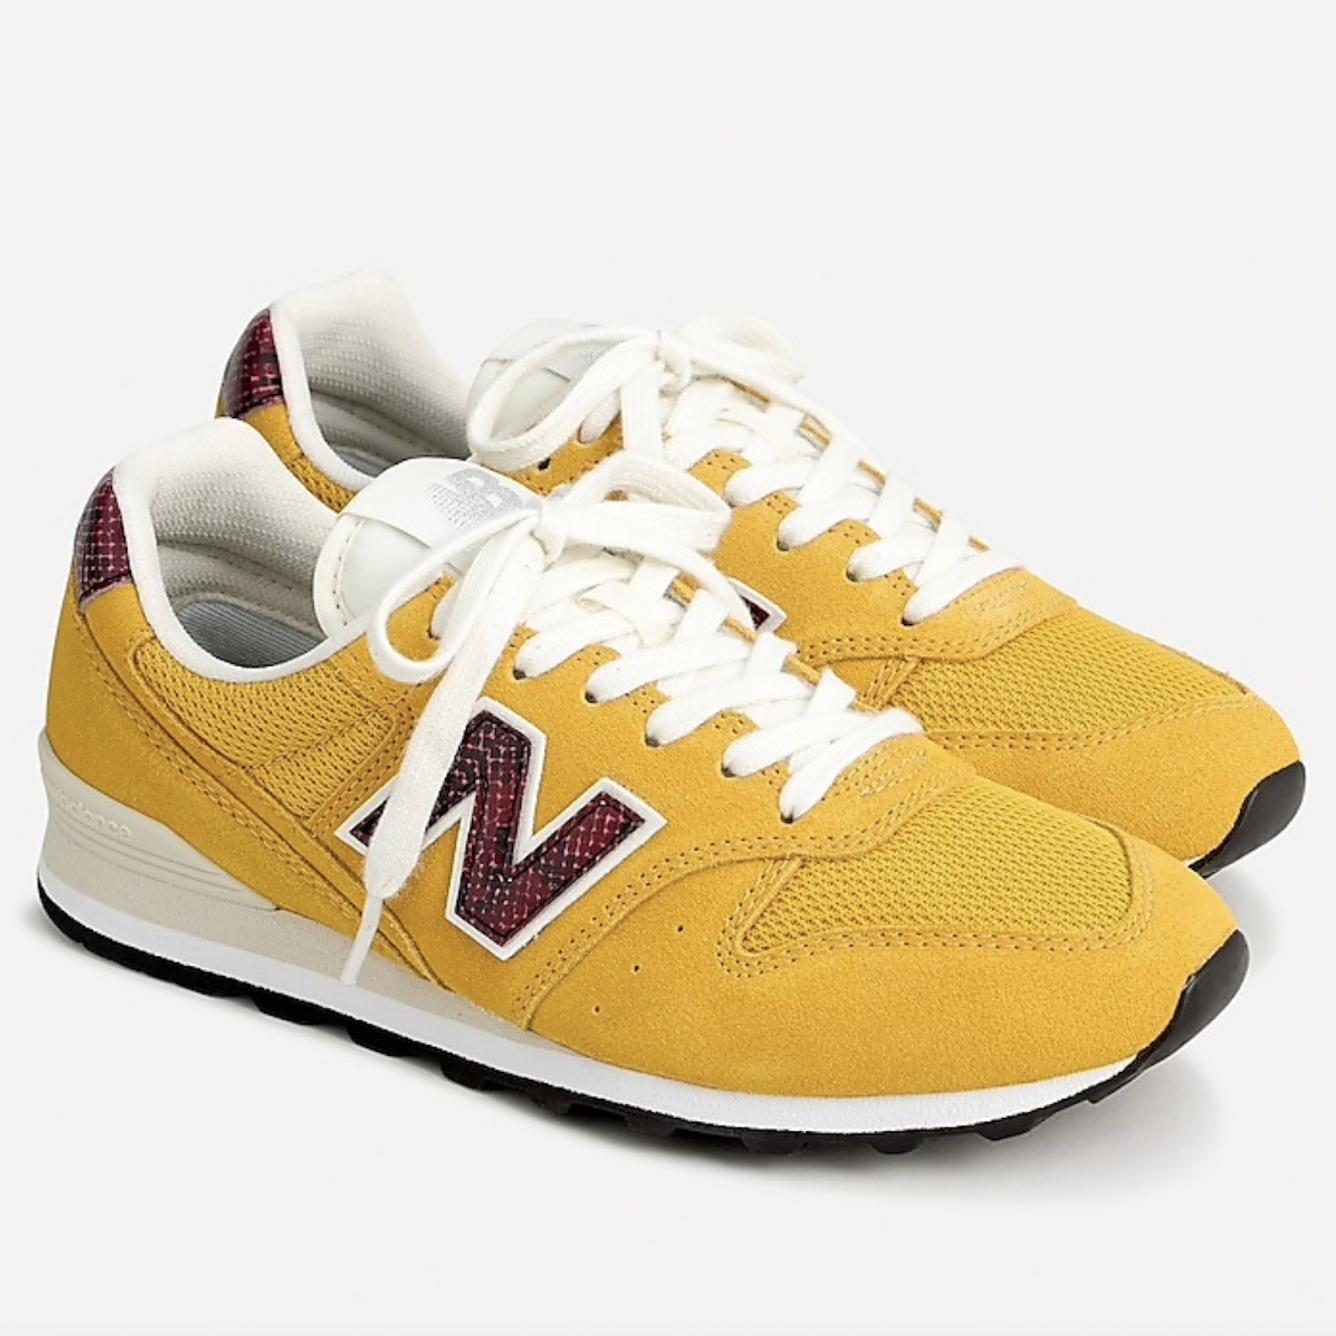 new balance yellow sneakers